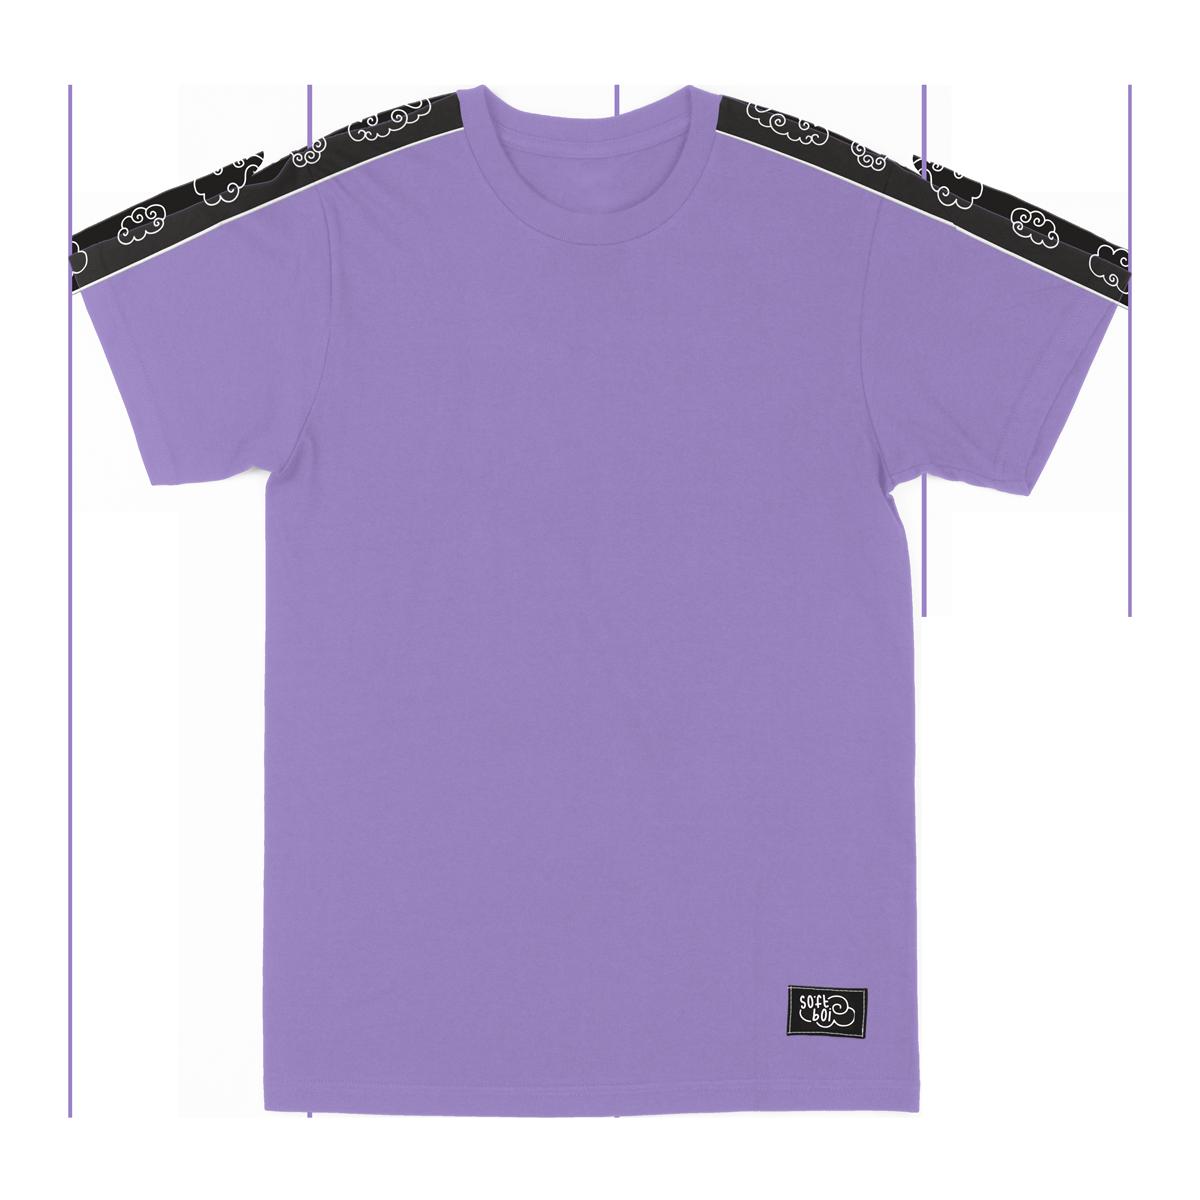 Sleeve Stripe Tee - Lavender